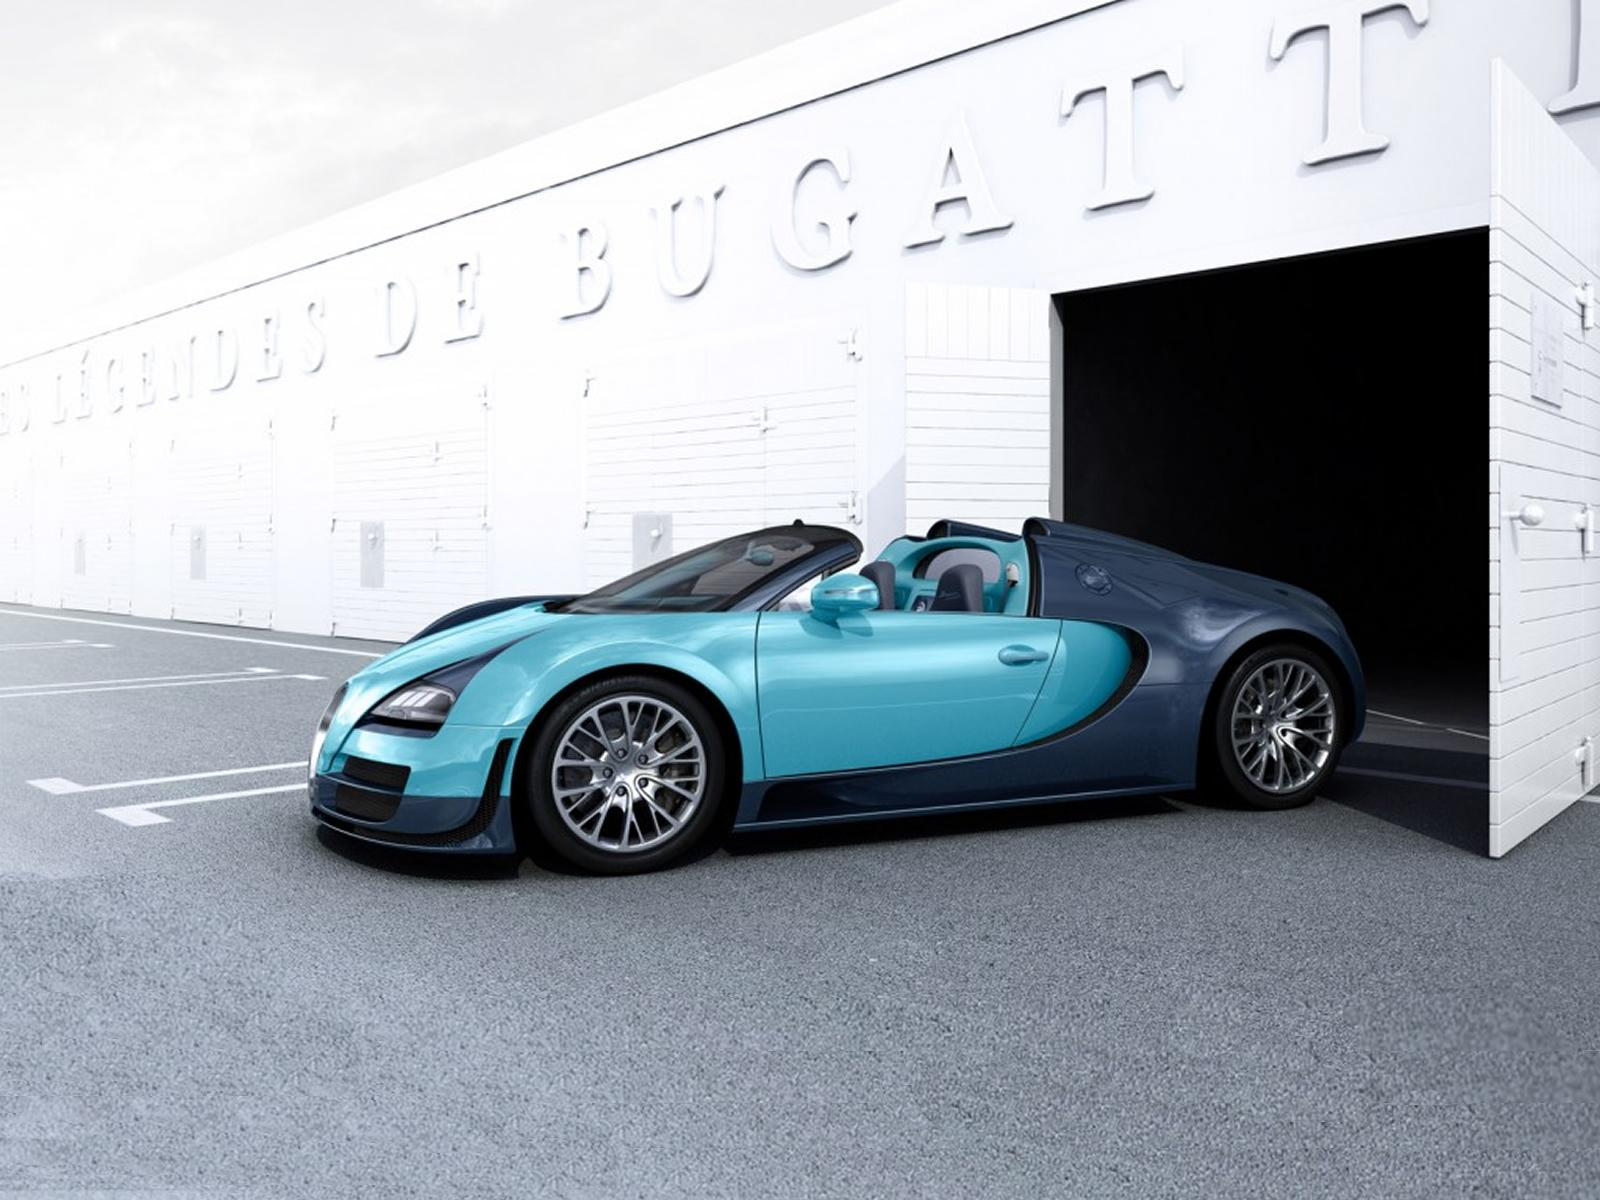 bugatti veyron grand sport vitesse jean pierre wimille se presenta. Black Bedroom Furniture Sets. Home Design Ideas